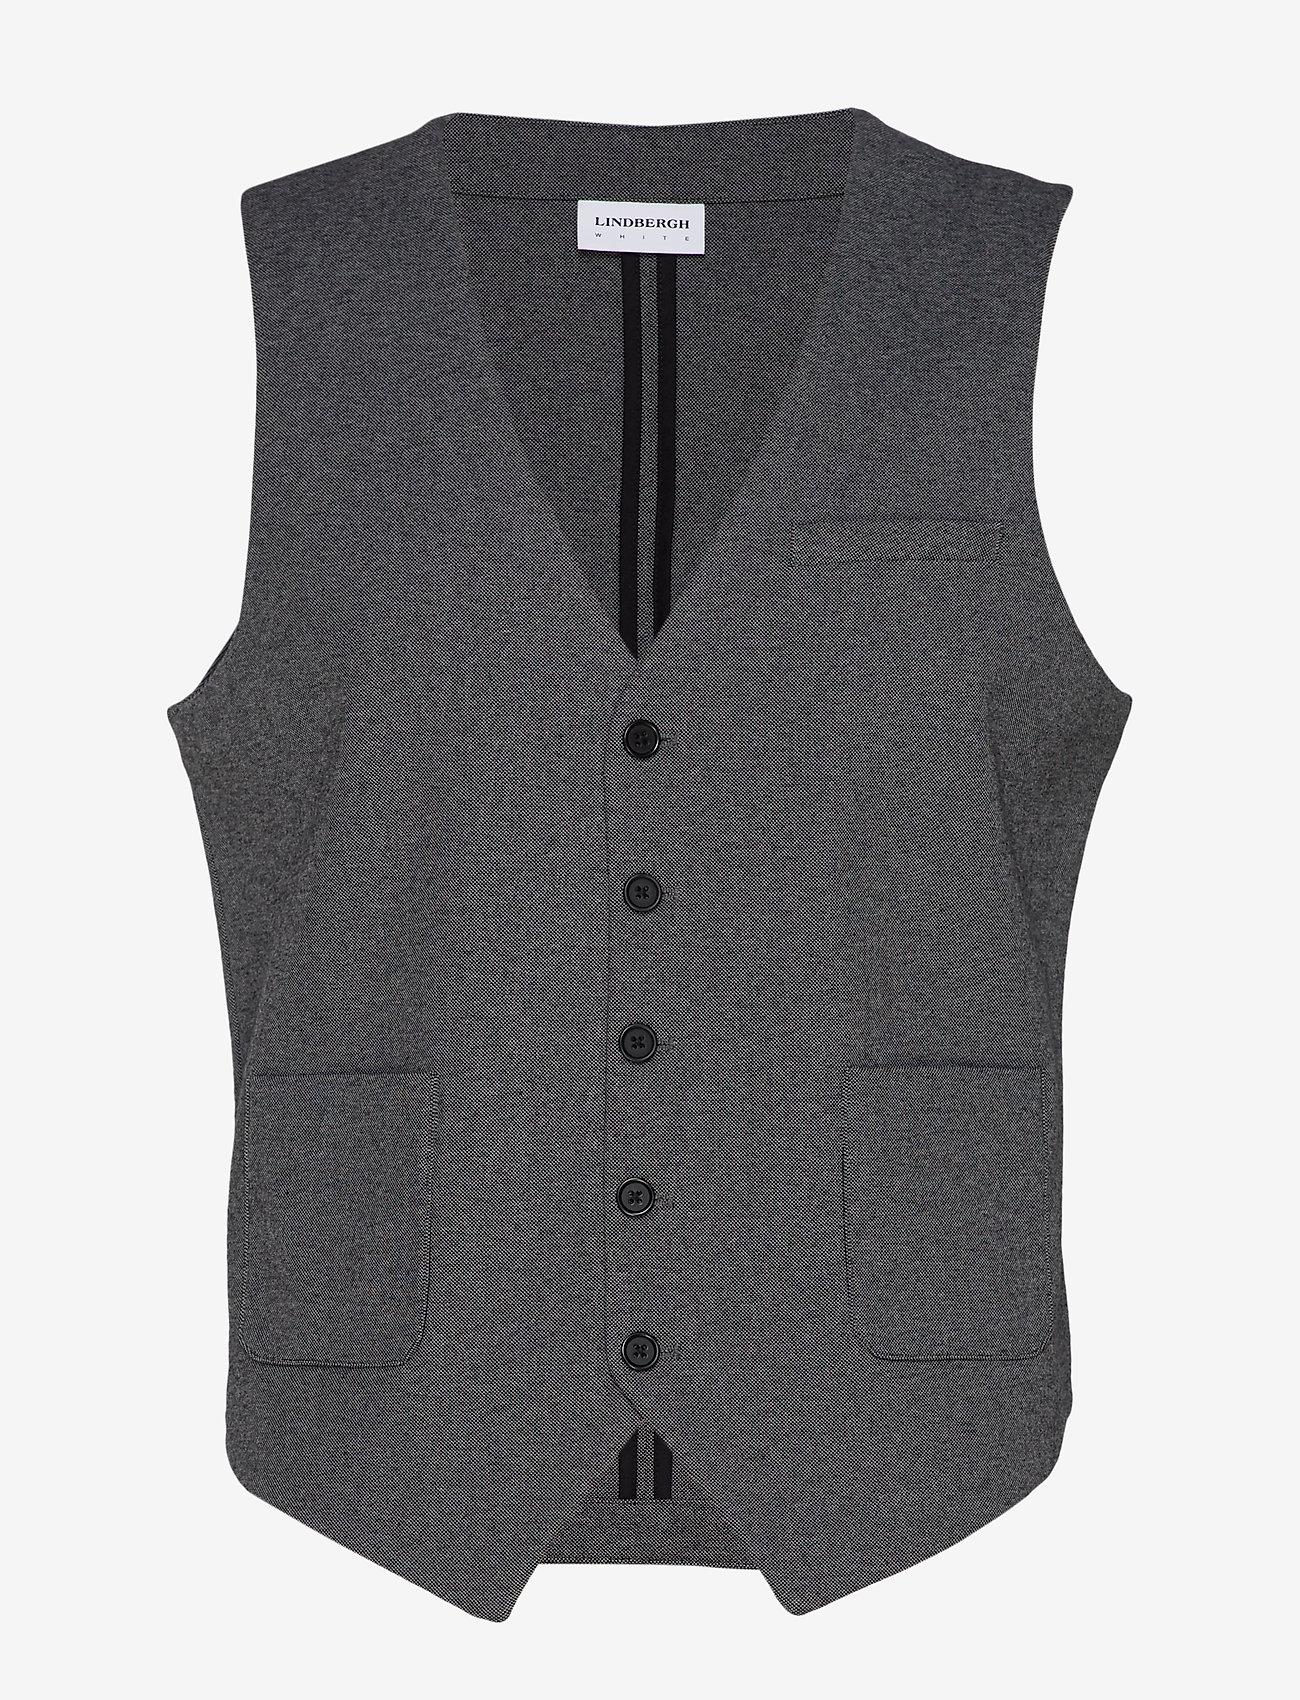 Lindbergh - Knitted waistcoat - waistcoats - grey mix - 1